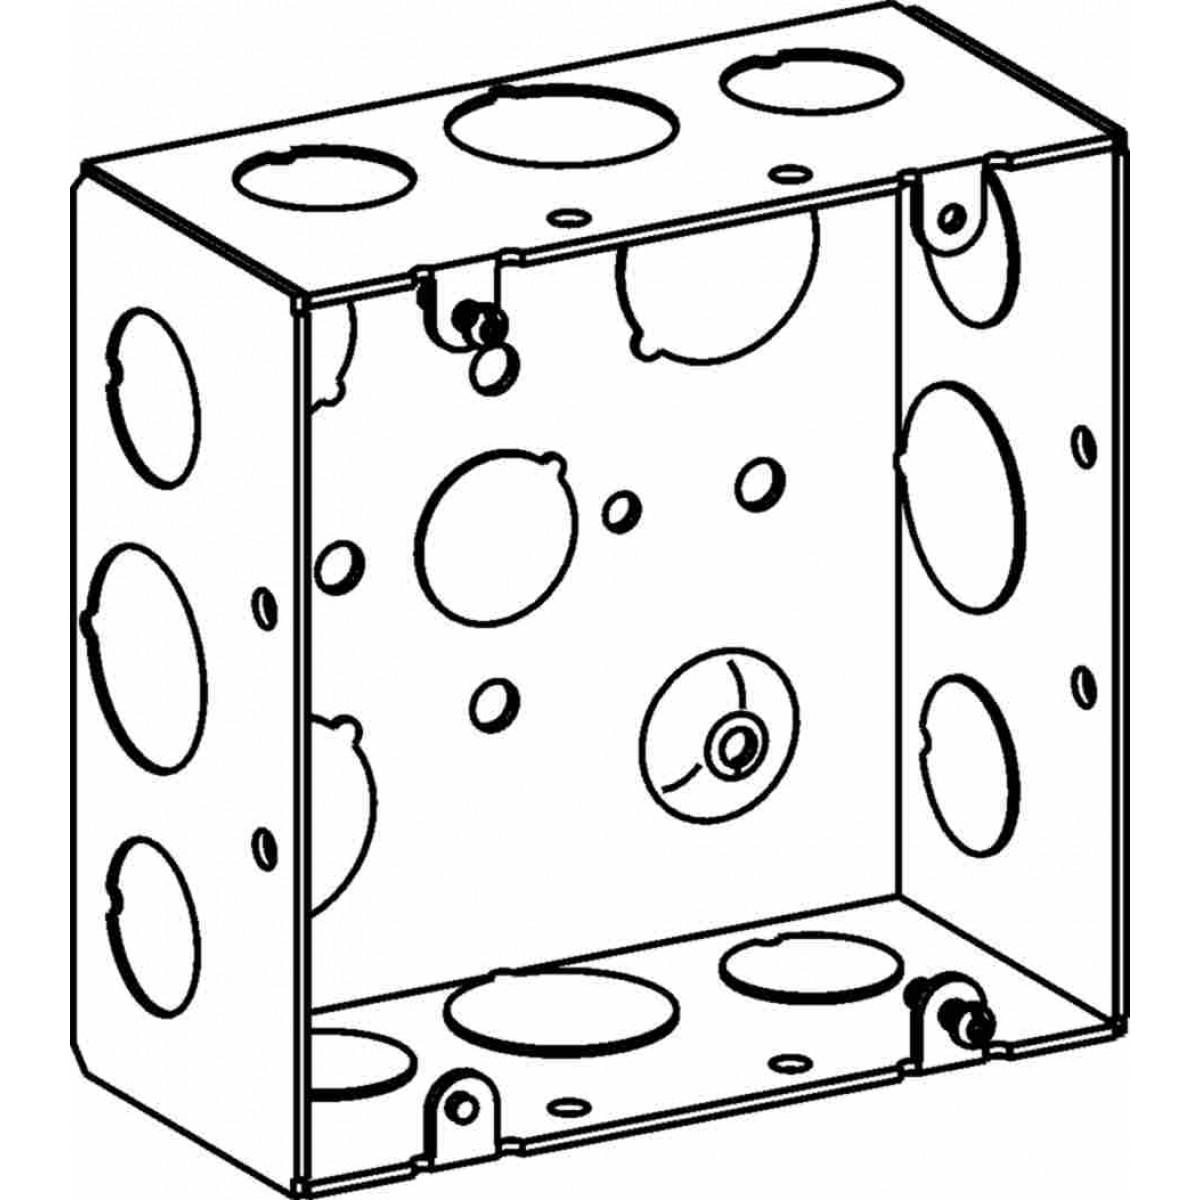 5sdb-50  75 - 4-11  16 u201d  5s  boxes